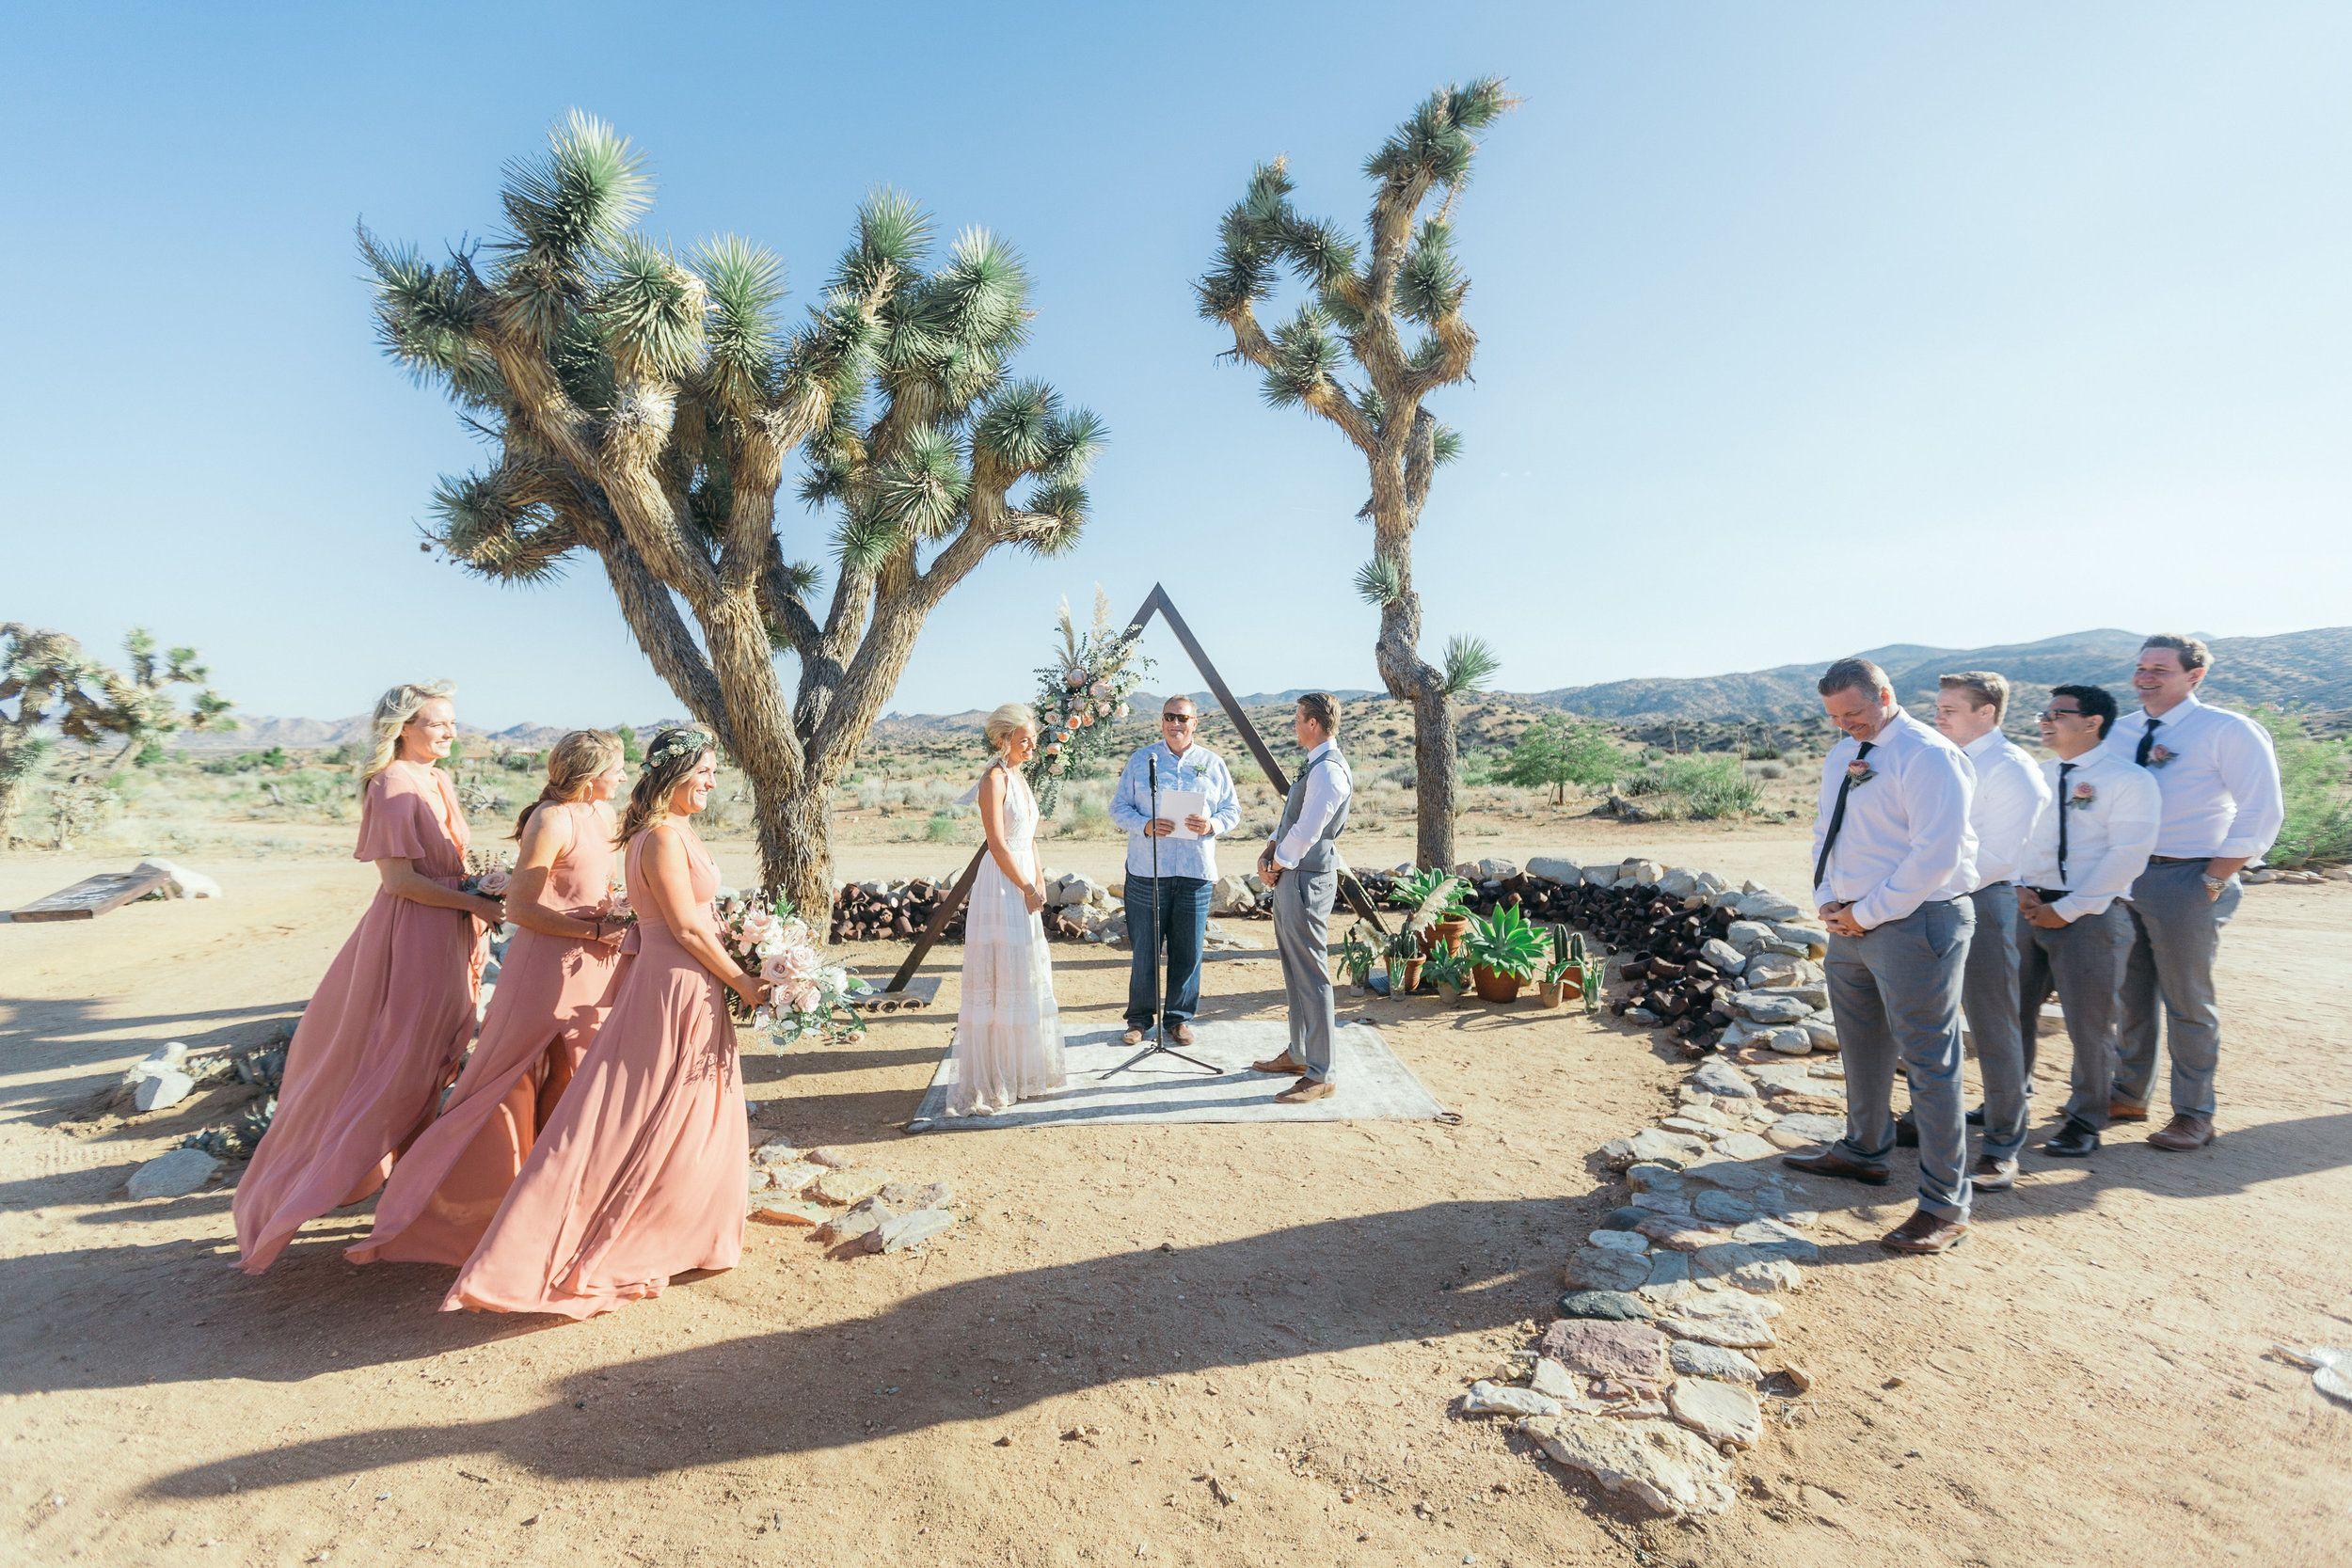 Bohemian Wedding Triangle Ceremony Arch Joshua Trees King Protea Rimrock Ranch Desert Venue Pioneertown California Art Soul Events